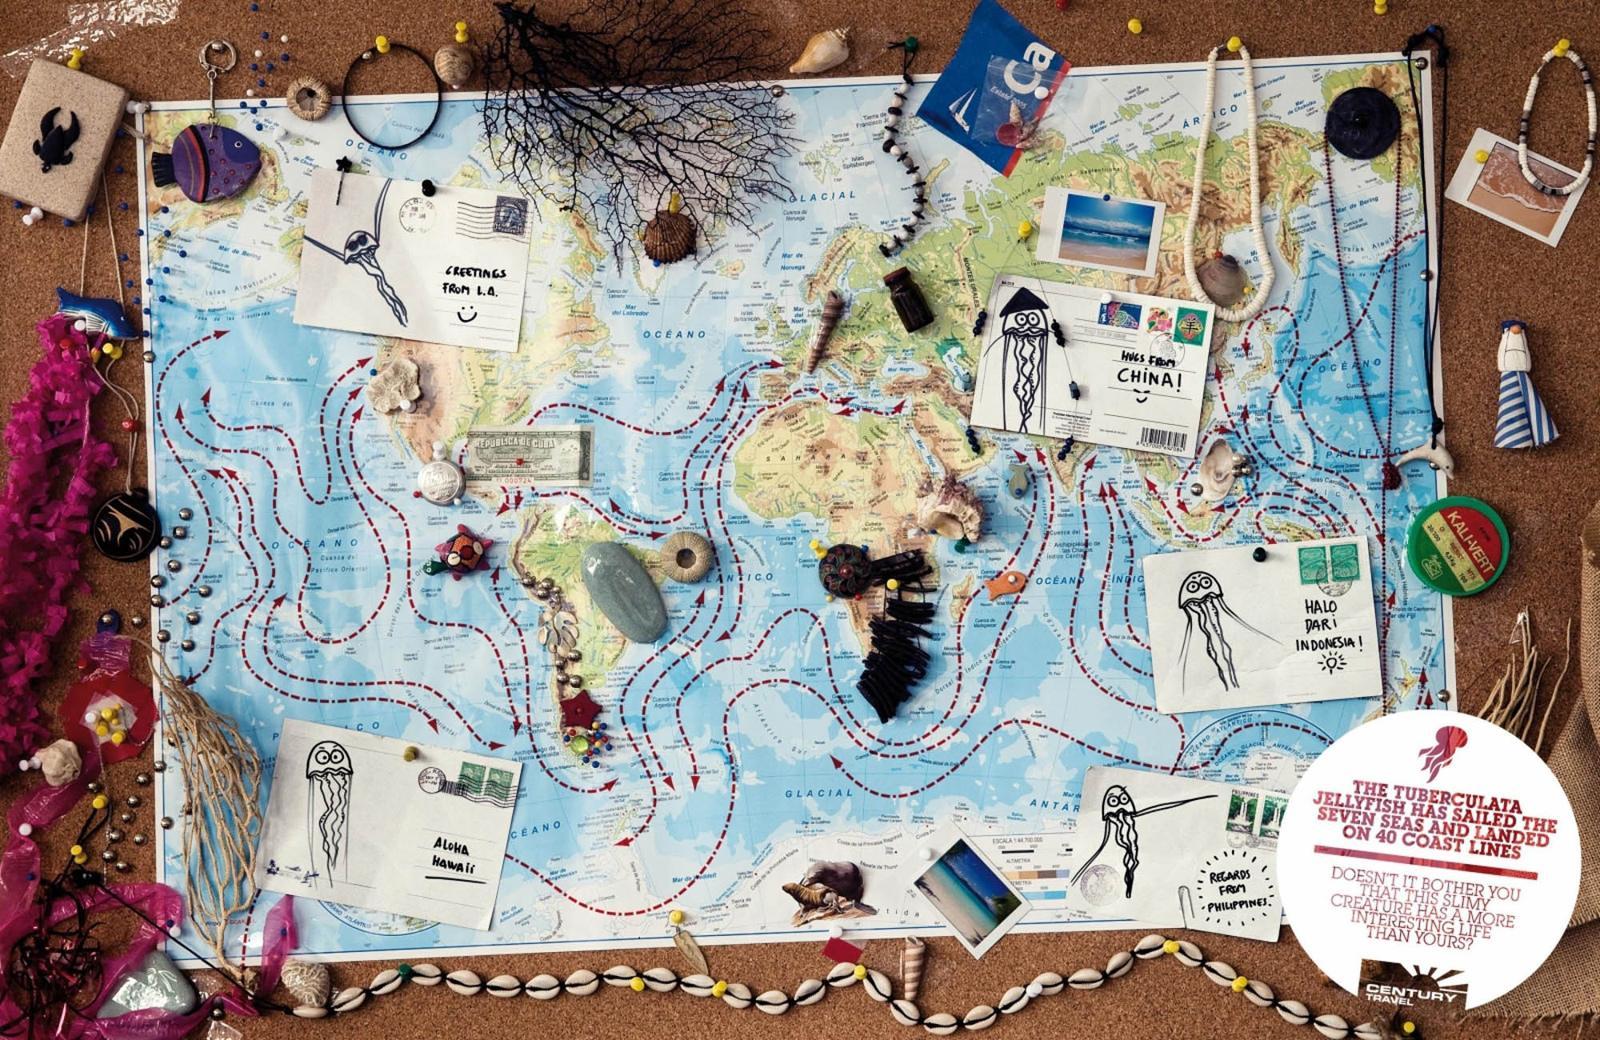 Century Travel Print Ad -  Tuberculata Jellyfish